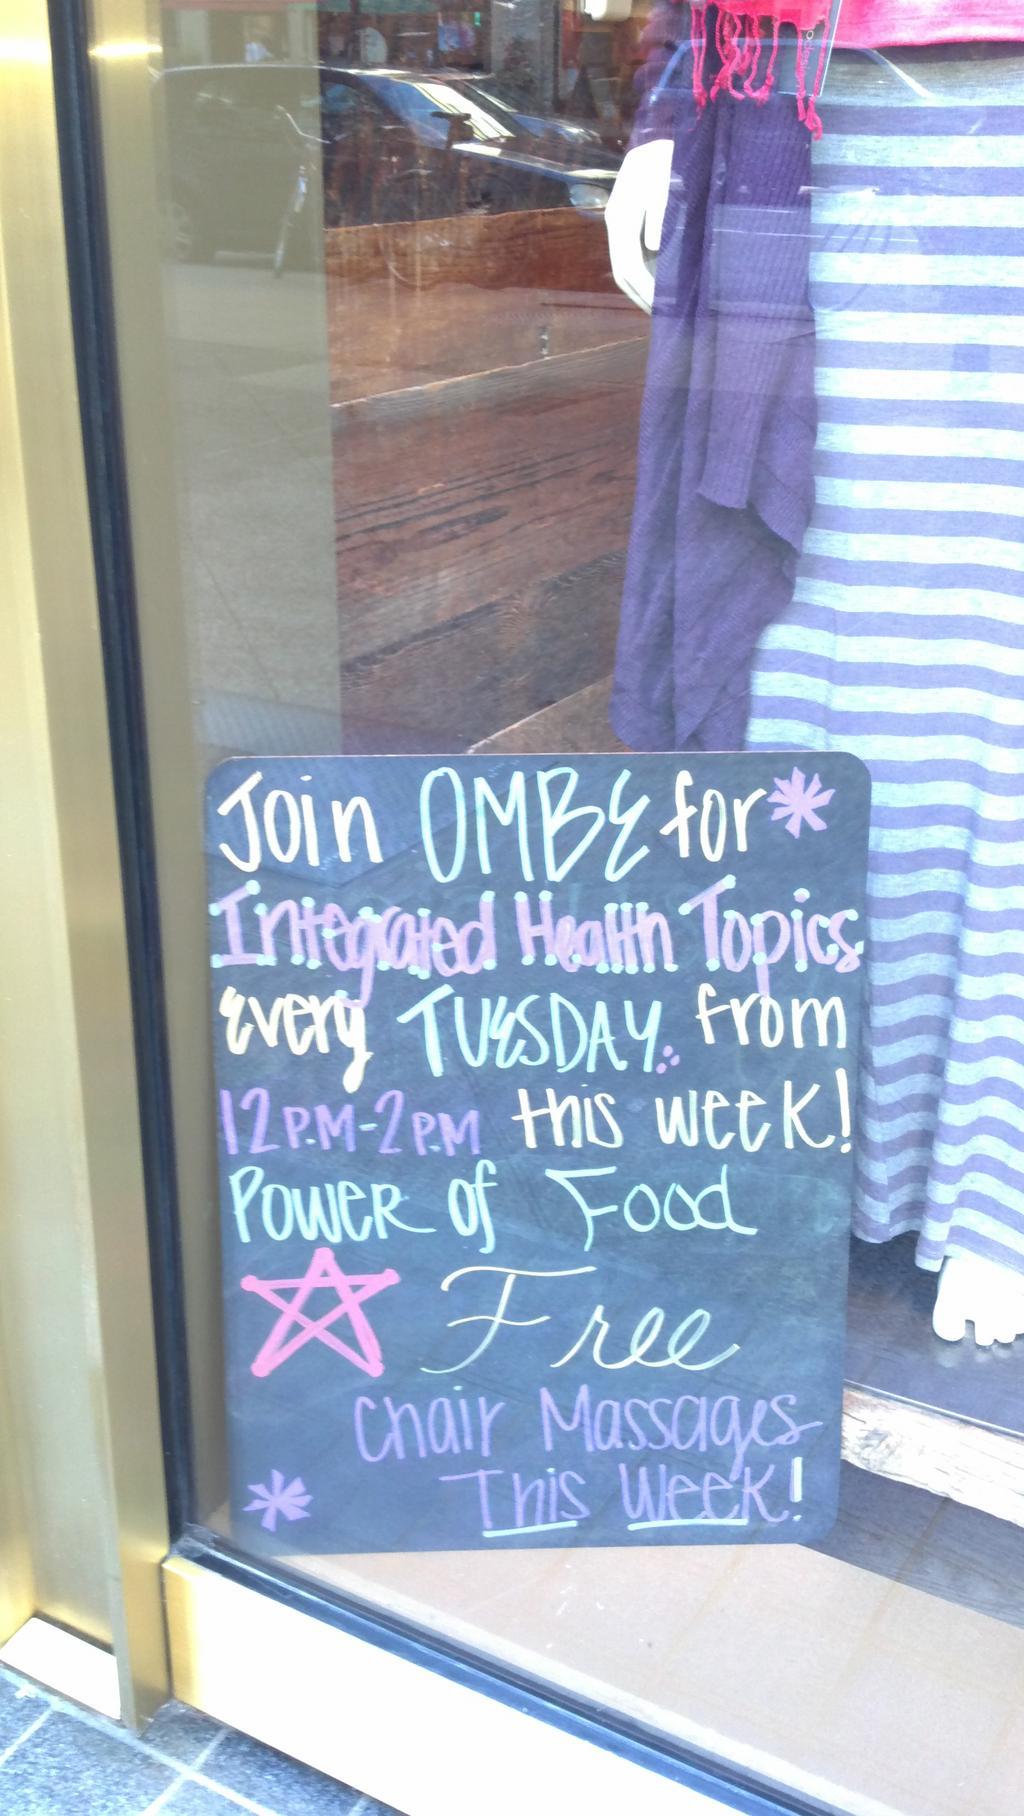 Power of Food + Massage @ Athleta — OMBE Integrative Health Center